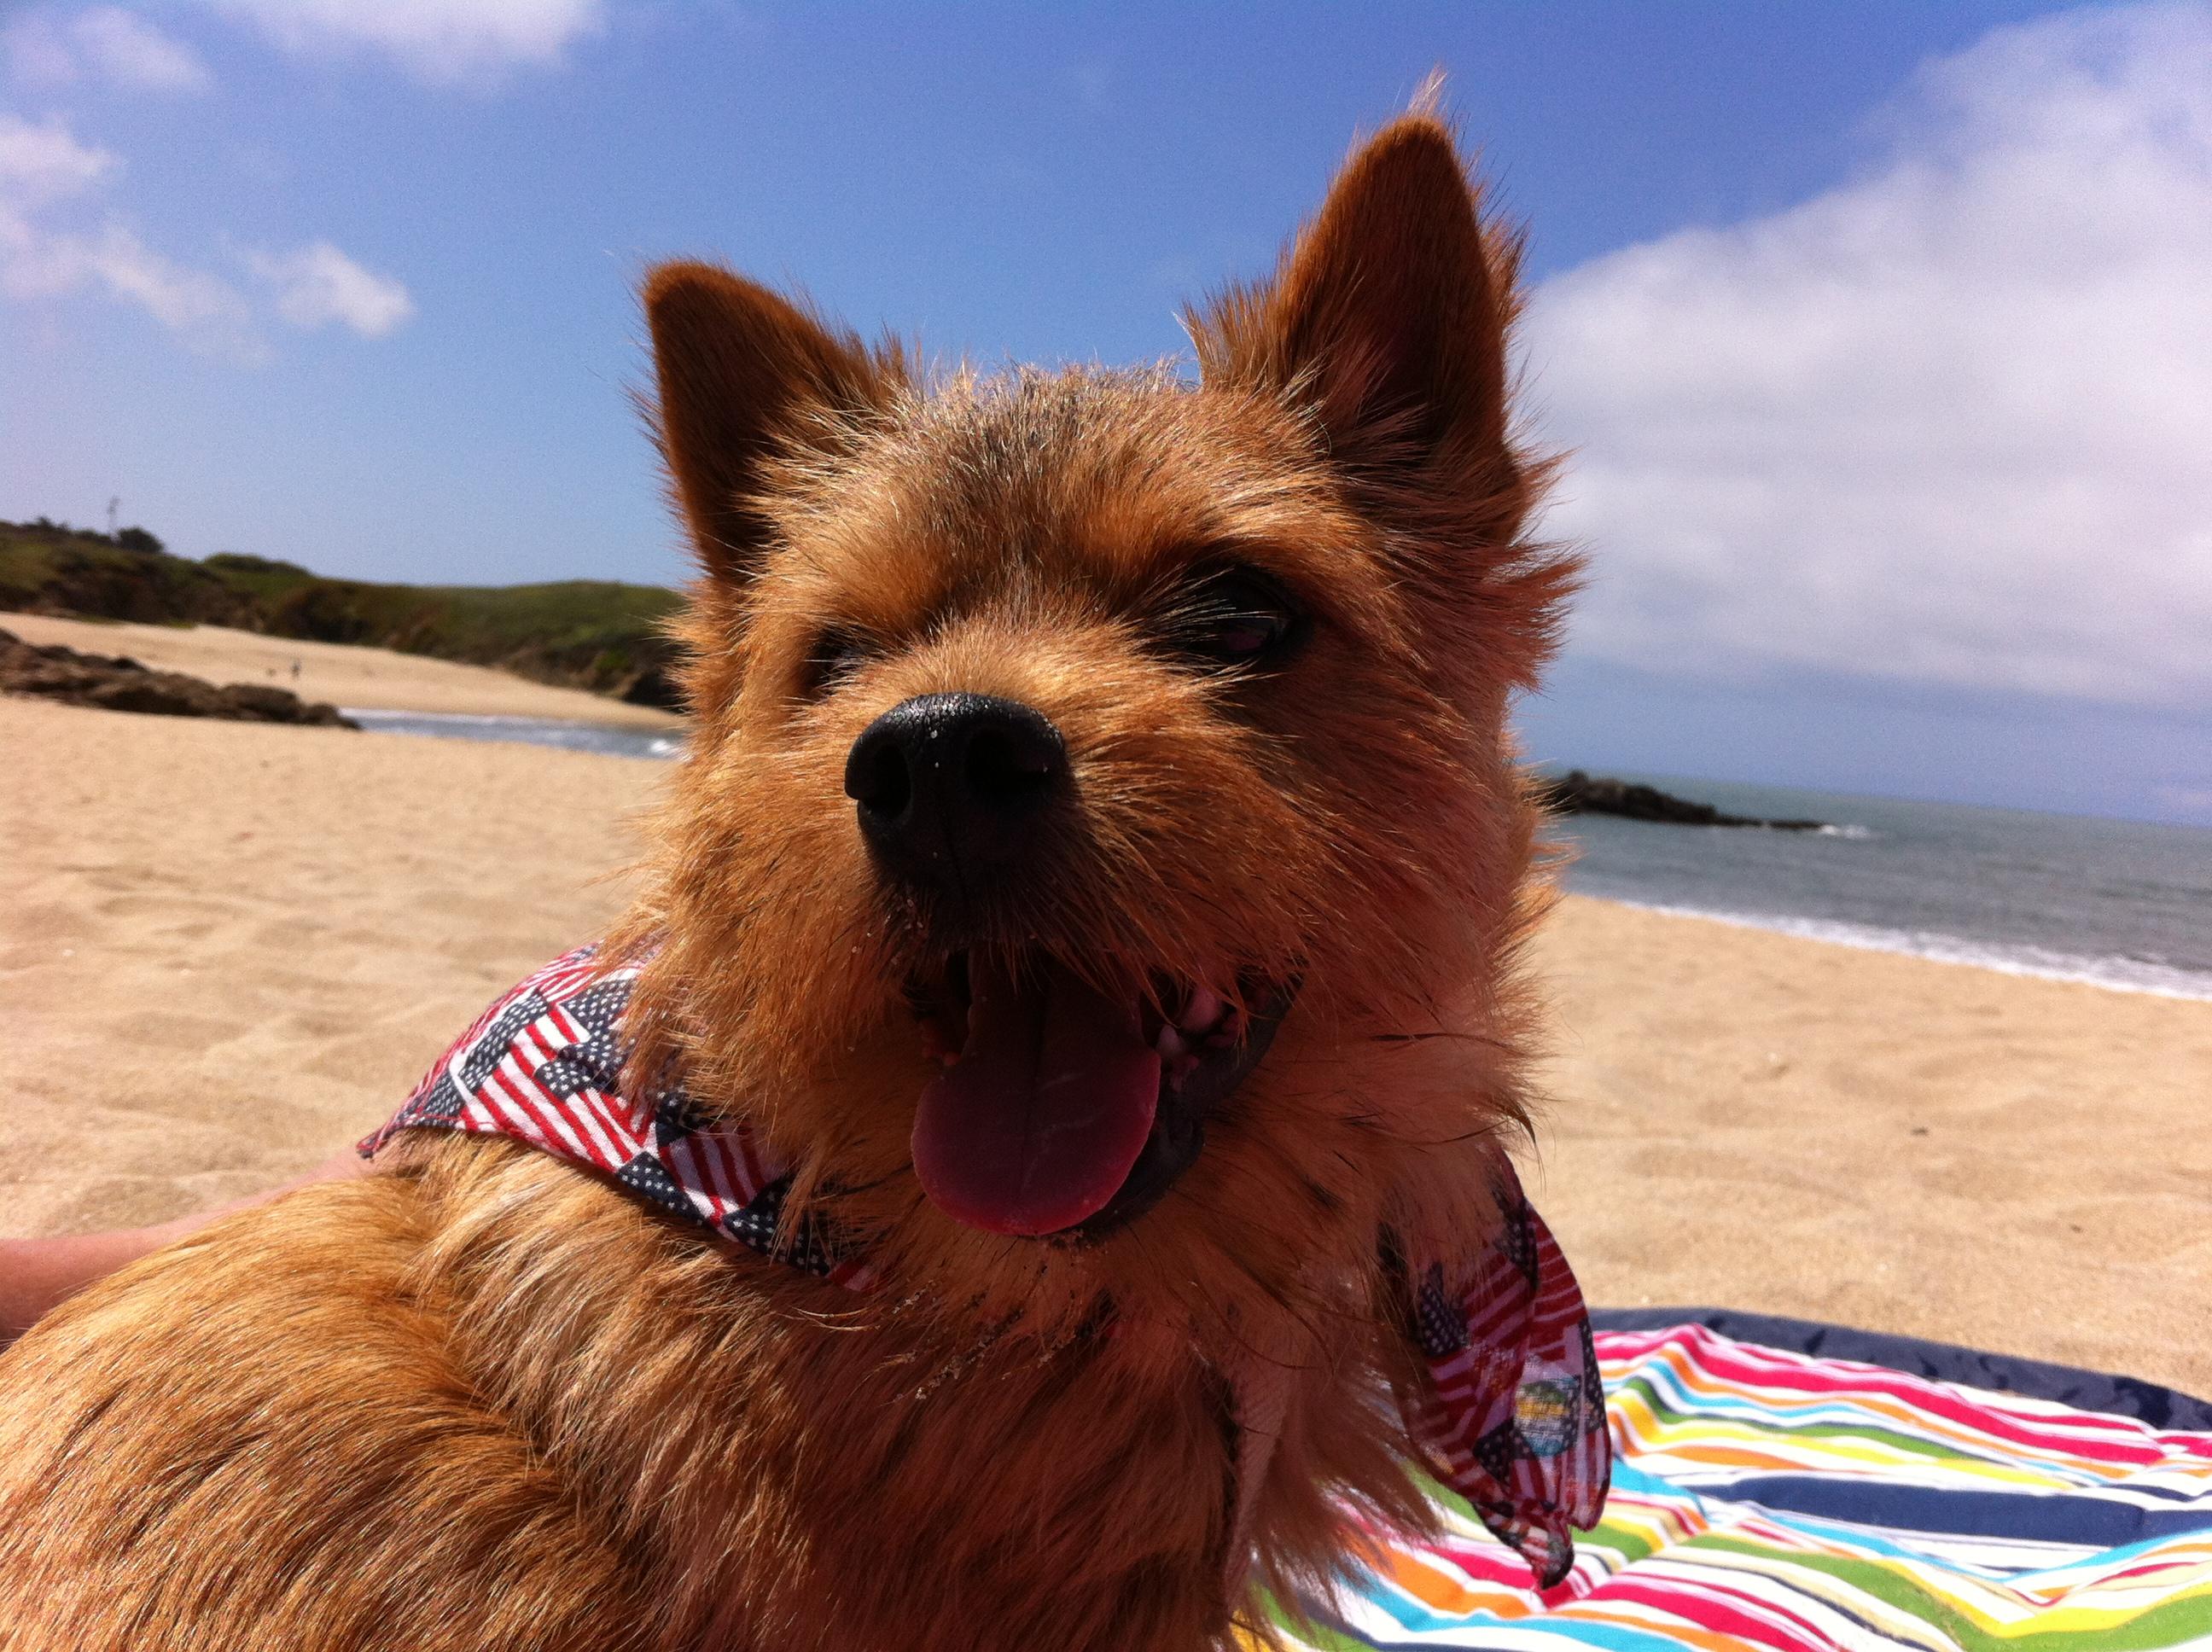 Norwich Terrier on the beach wallpaper